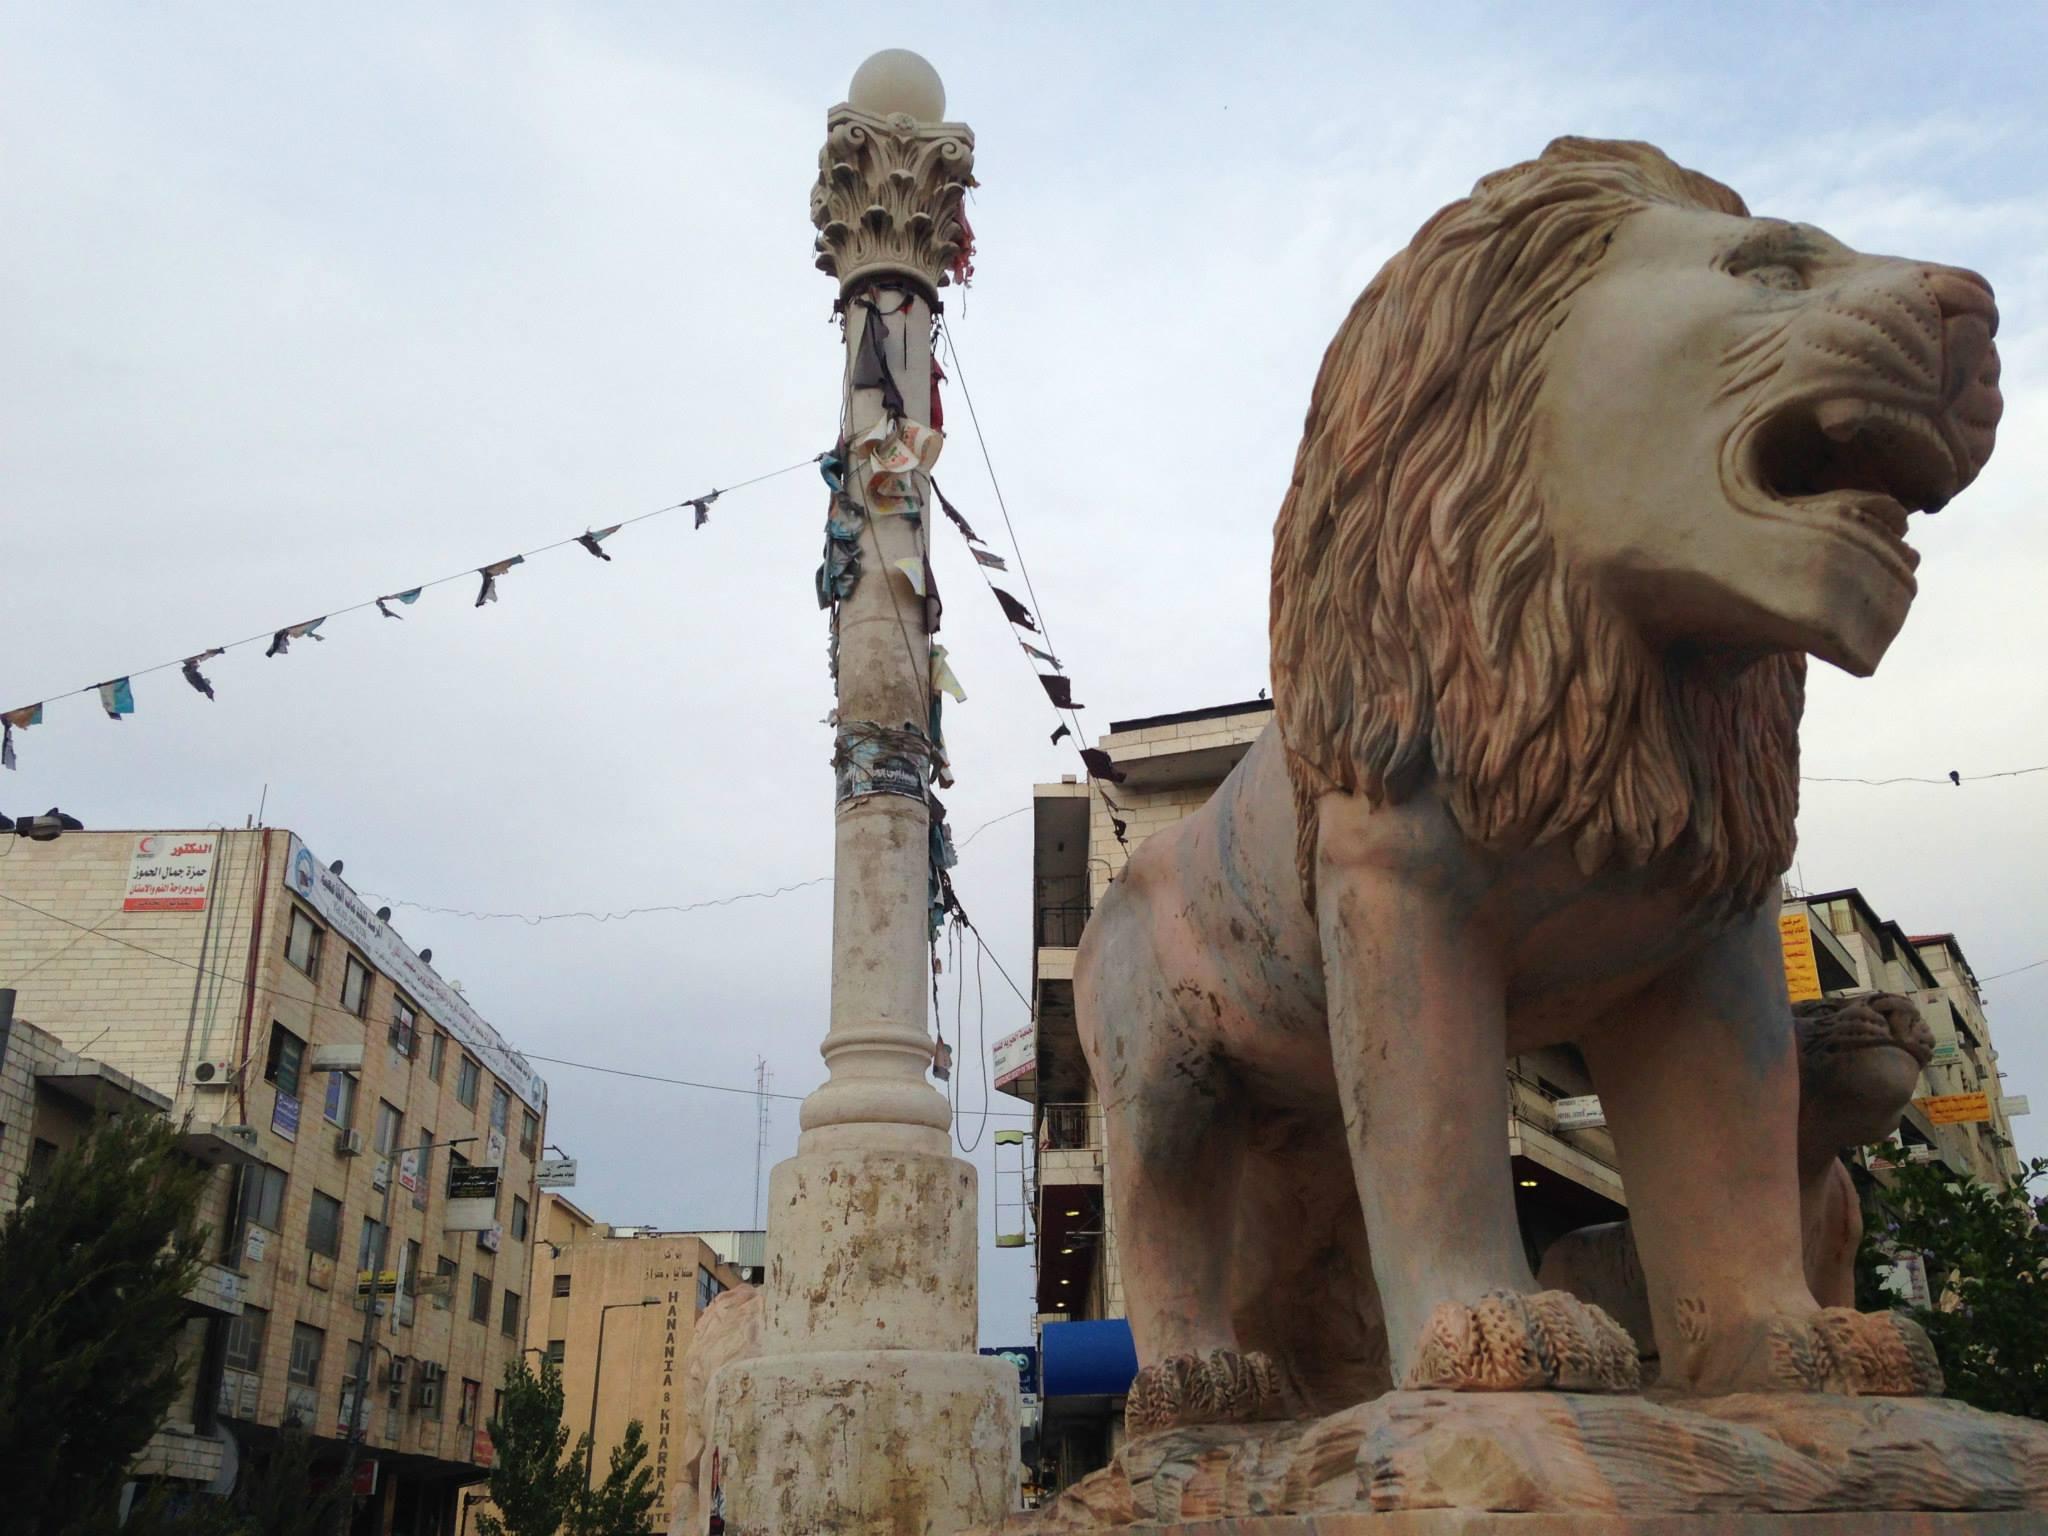 Al Manara square in Ramallah